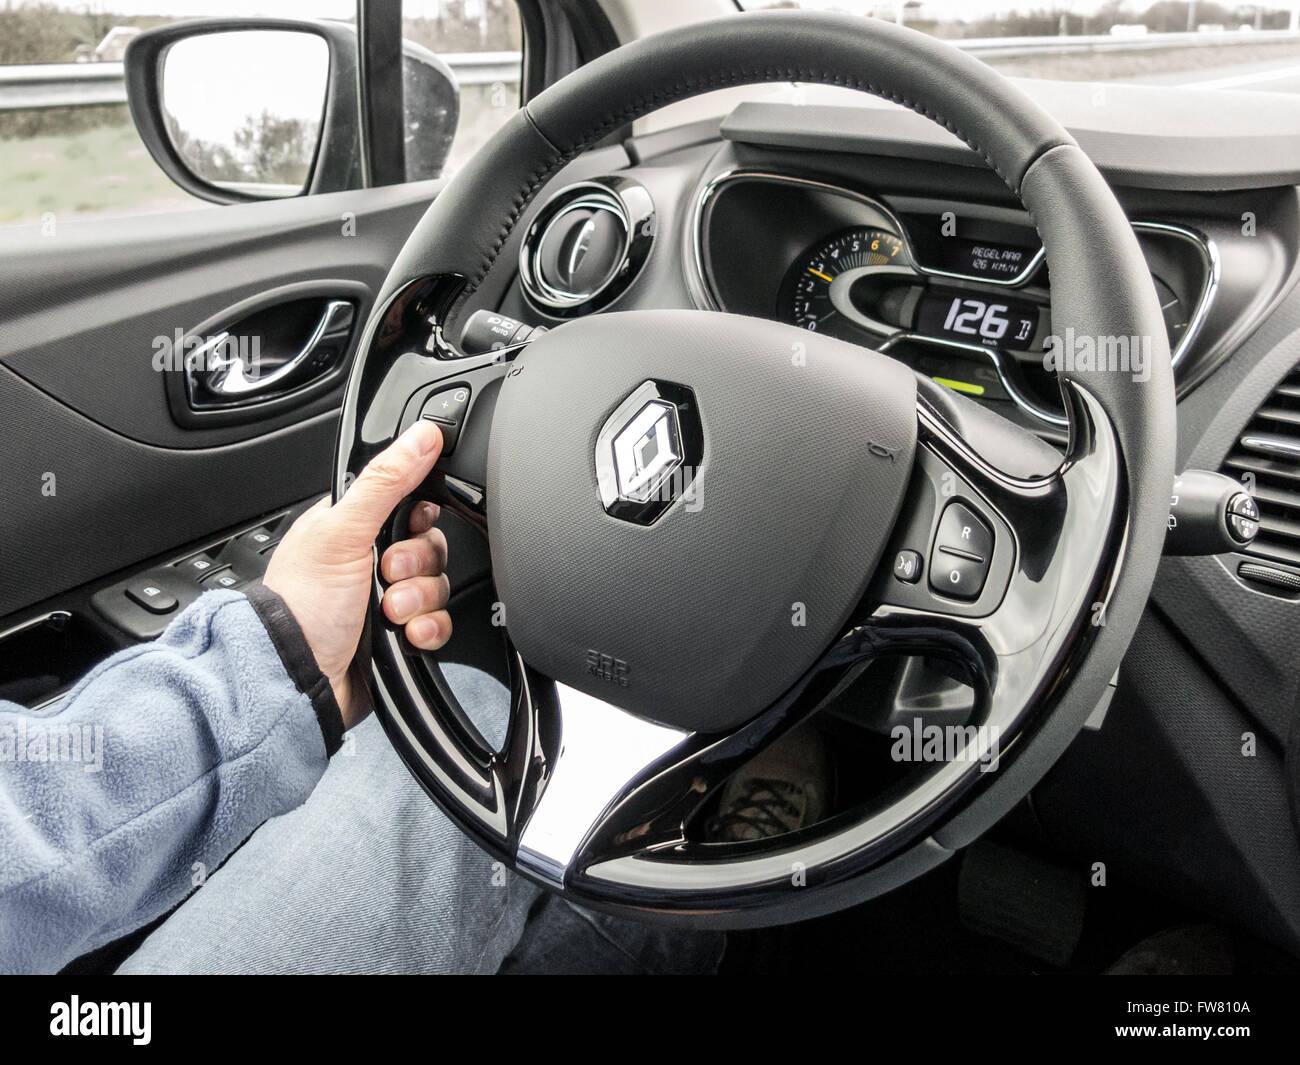 Fahrer mit Tempomat am Lenkrad beim Autofahren. Modernes Interieur ...